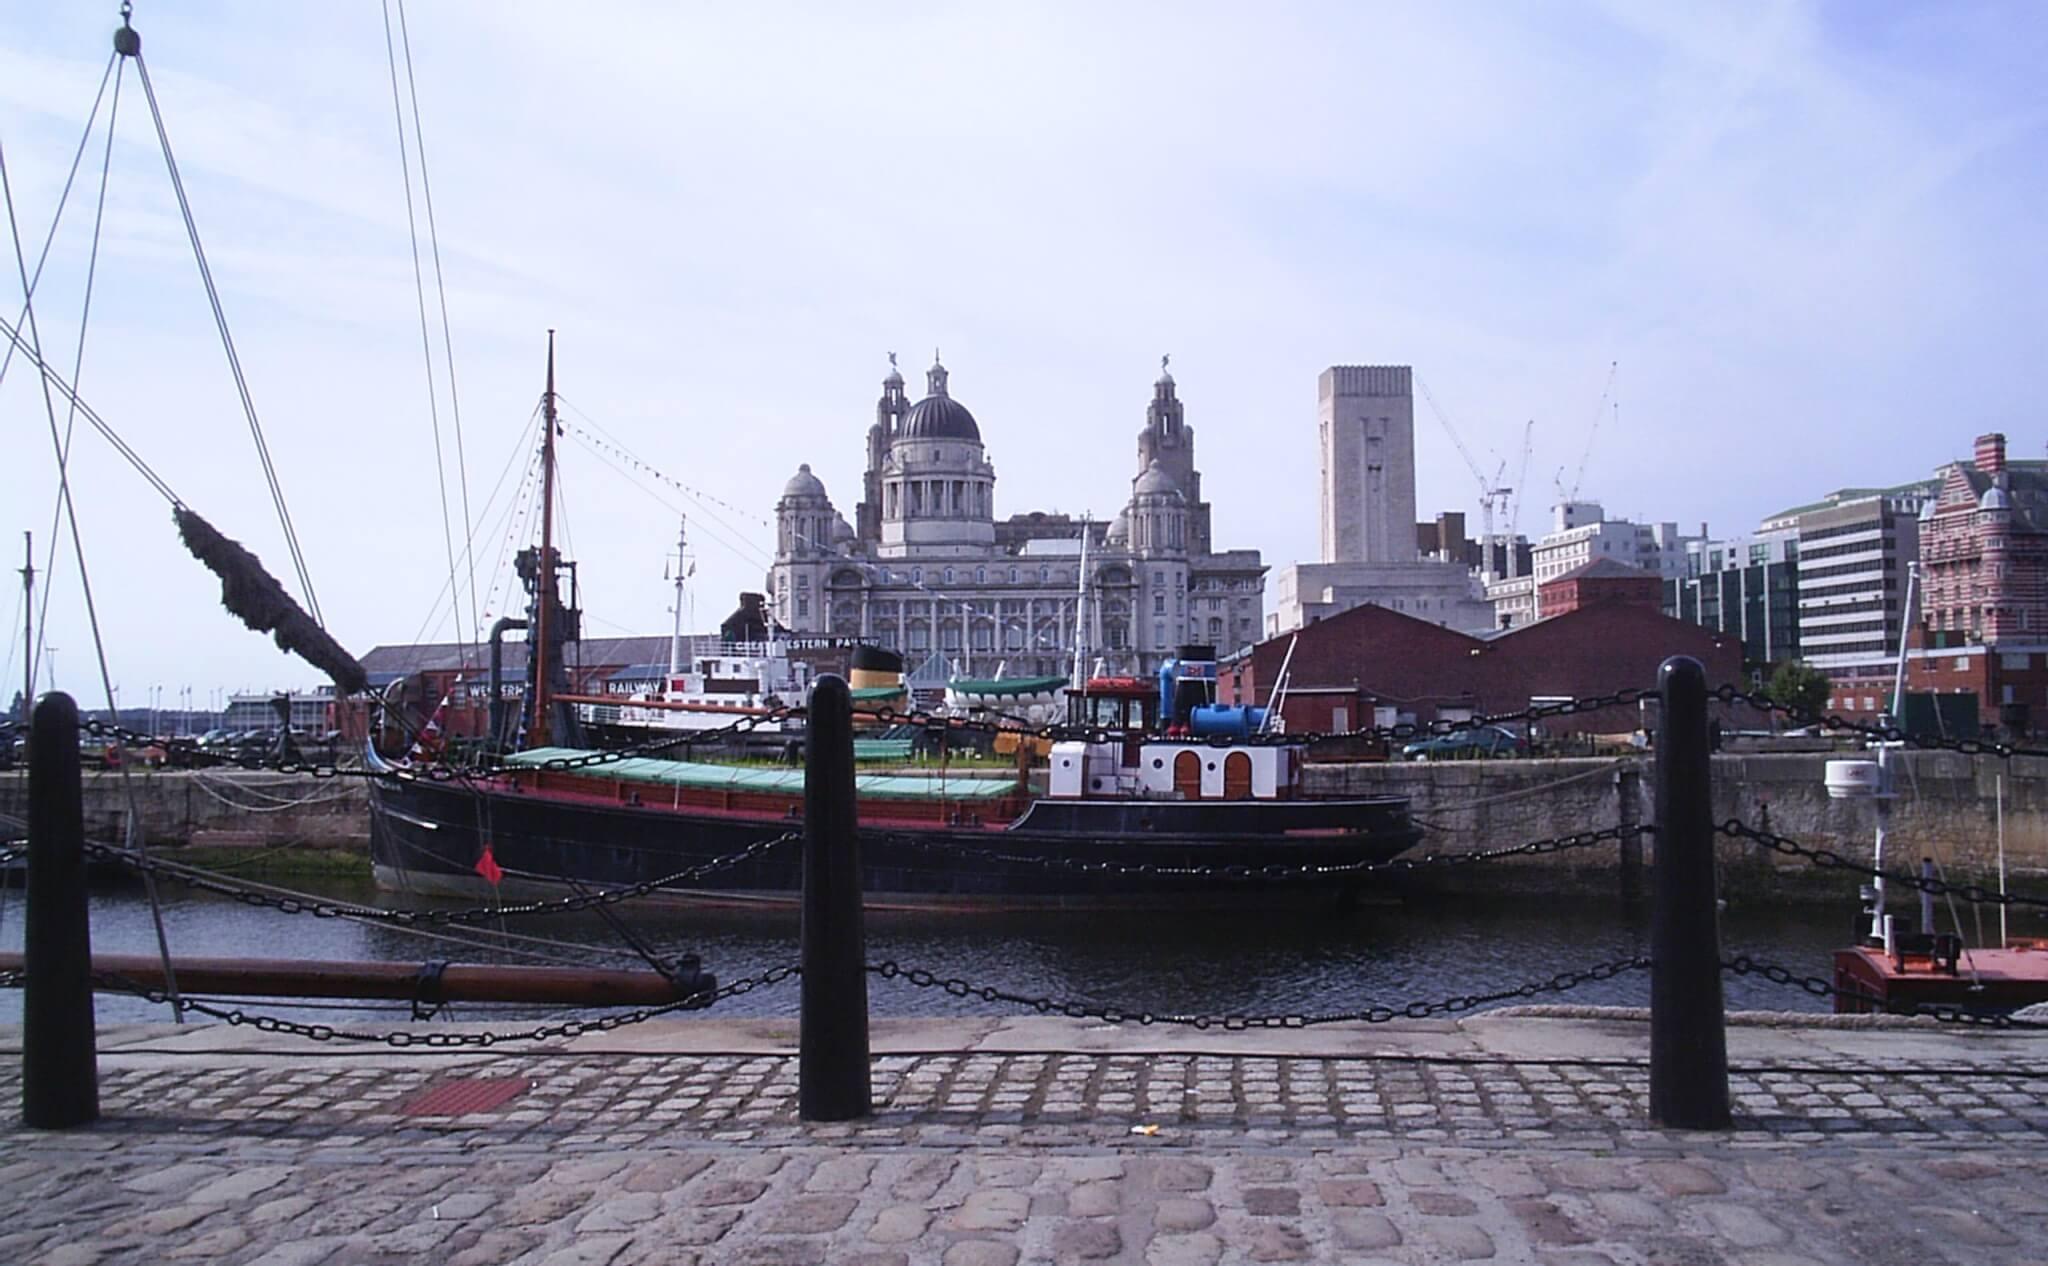 Maritime Merseyside